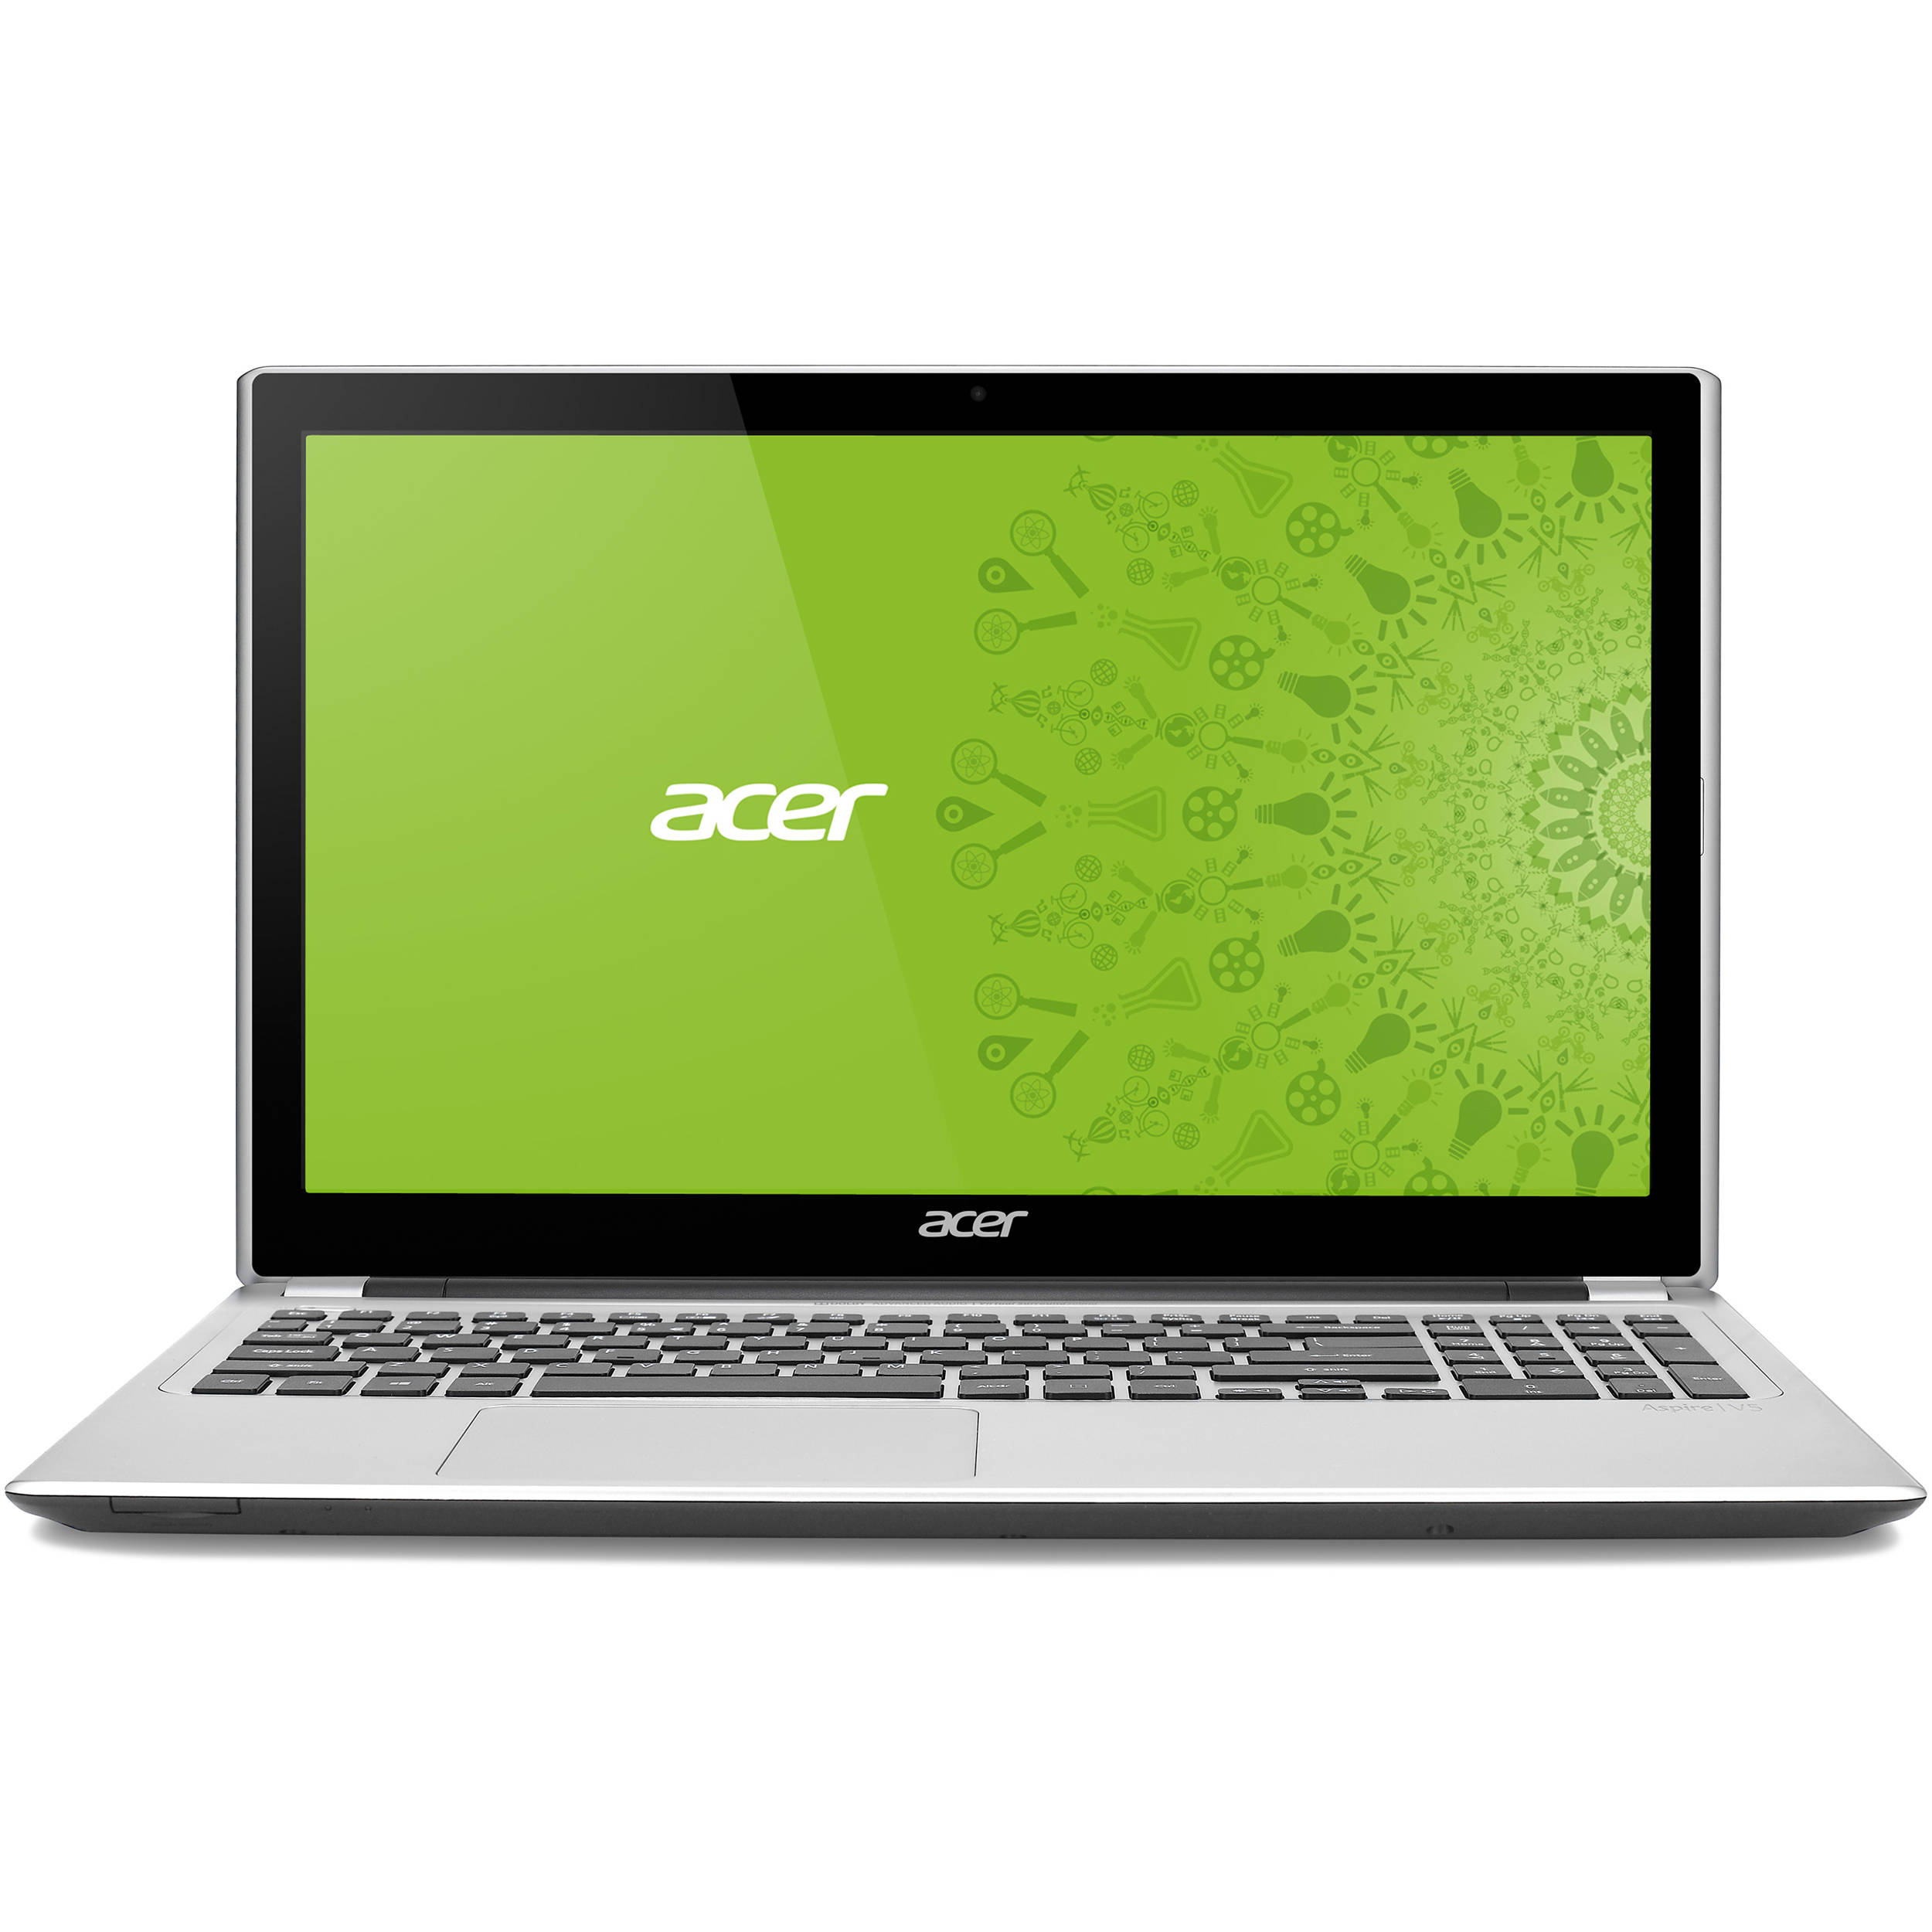 Acer Aspire V5-571P NVIDIA Graphics Windows 8 Driver Download